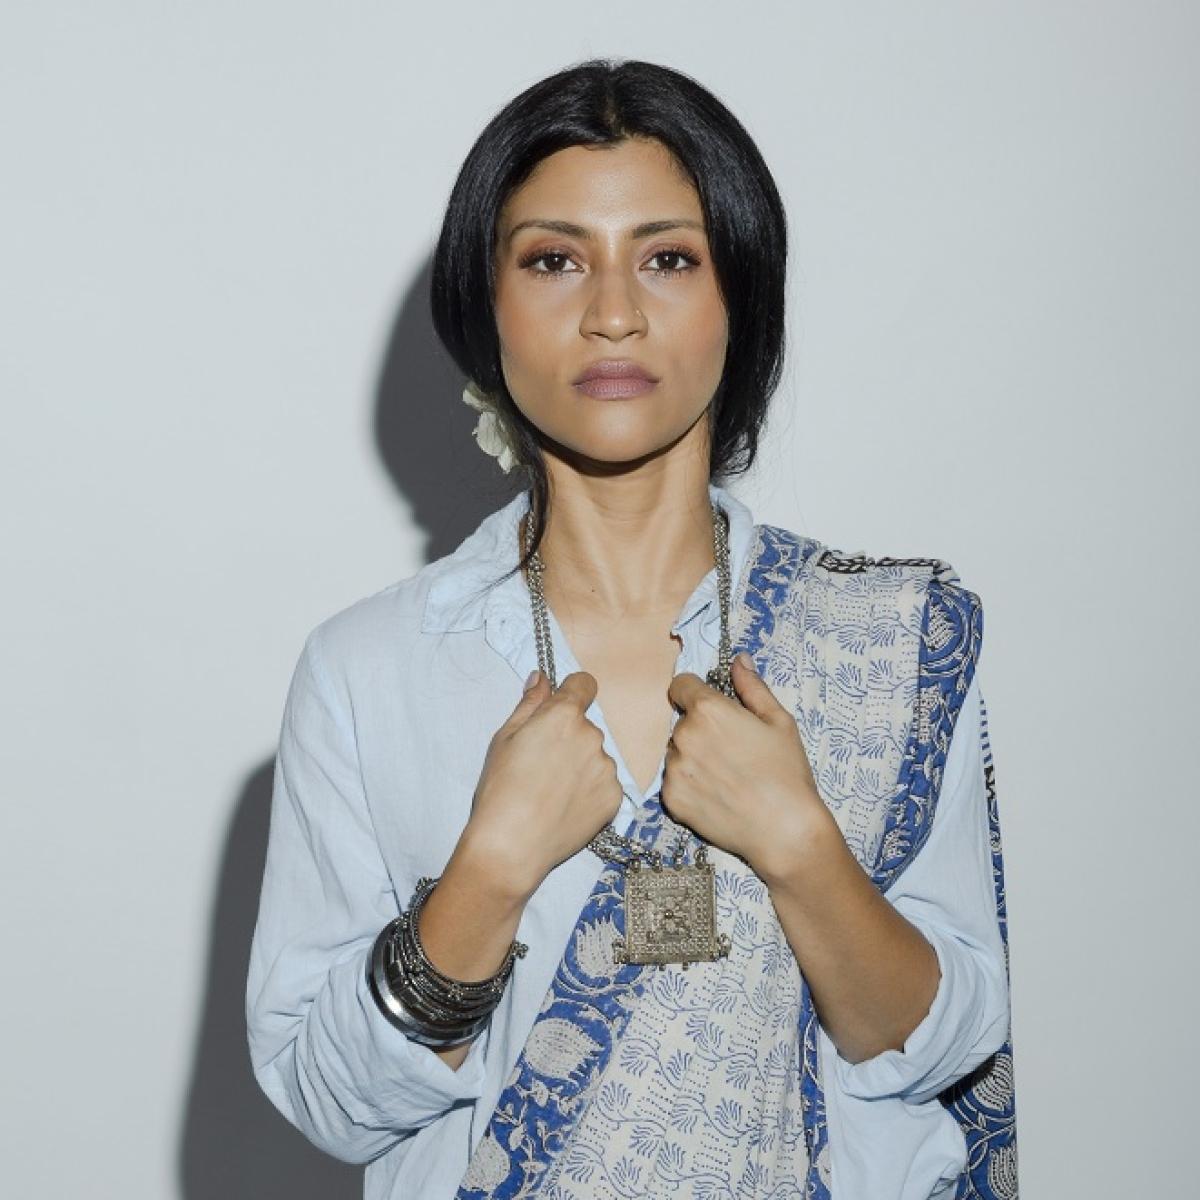 Konkona Sensharma: Being an 'outsider' gives you a certain amount of freedom